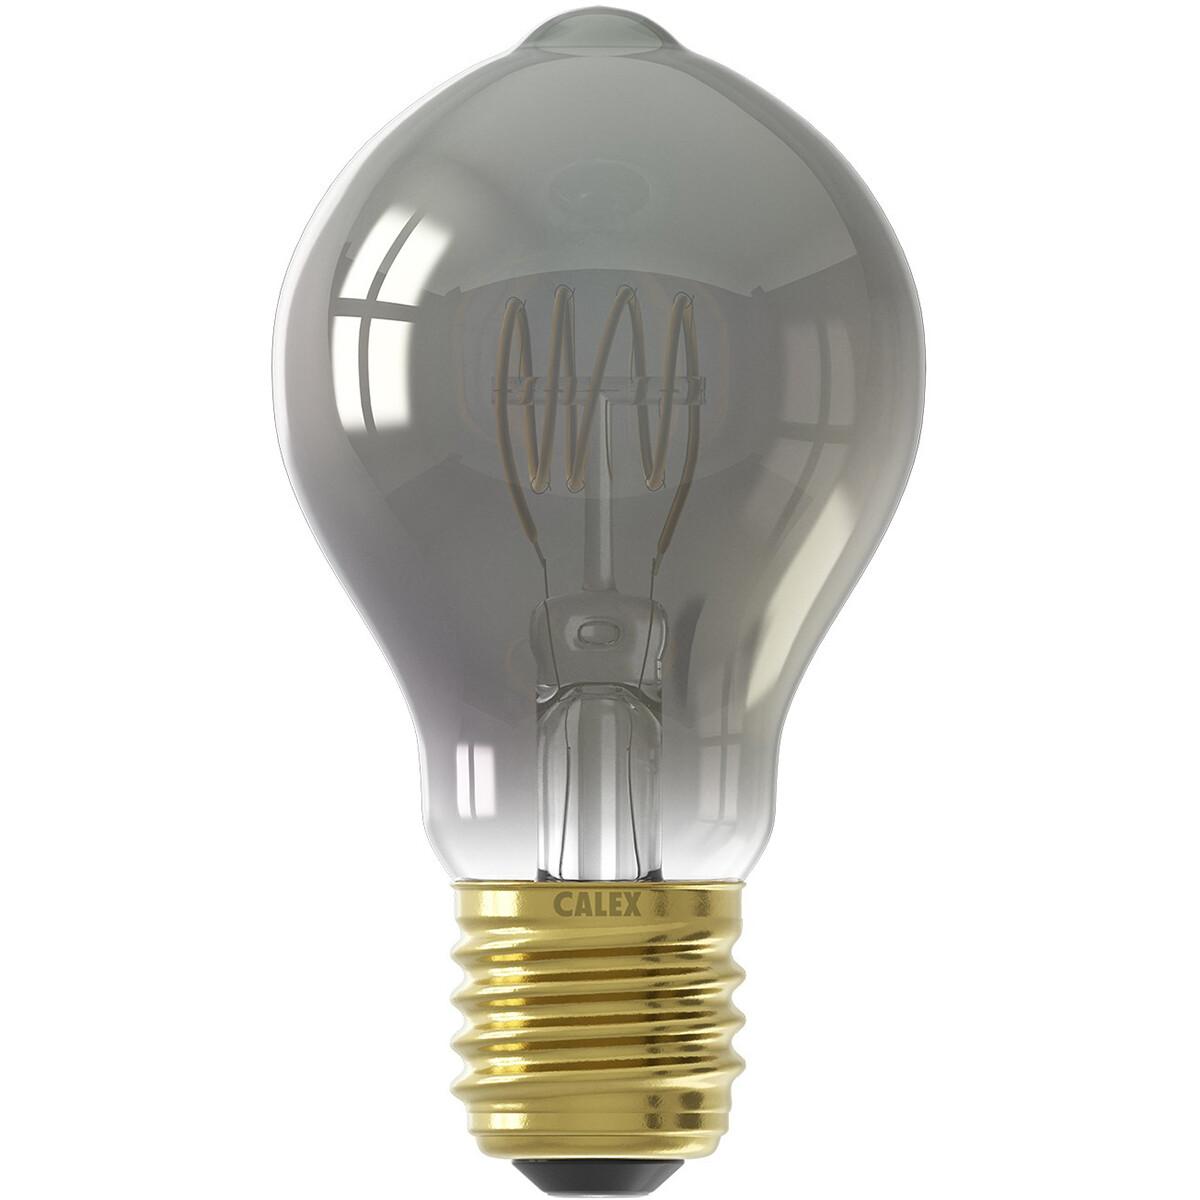 CALEX - LED Lamp - Filament A60 - E27 Fitting - Dimbaar - 4W - Warm Wit 2100K - Titanium